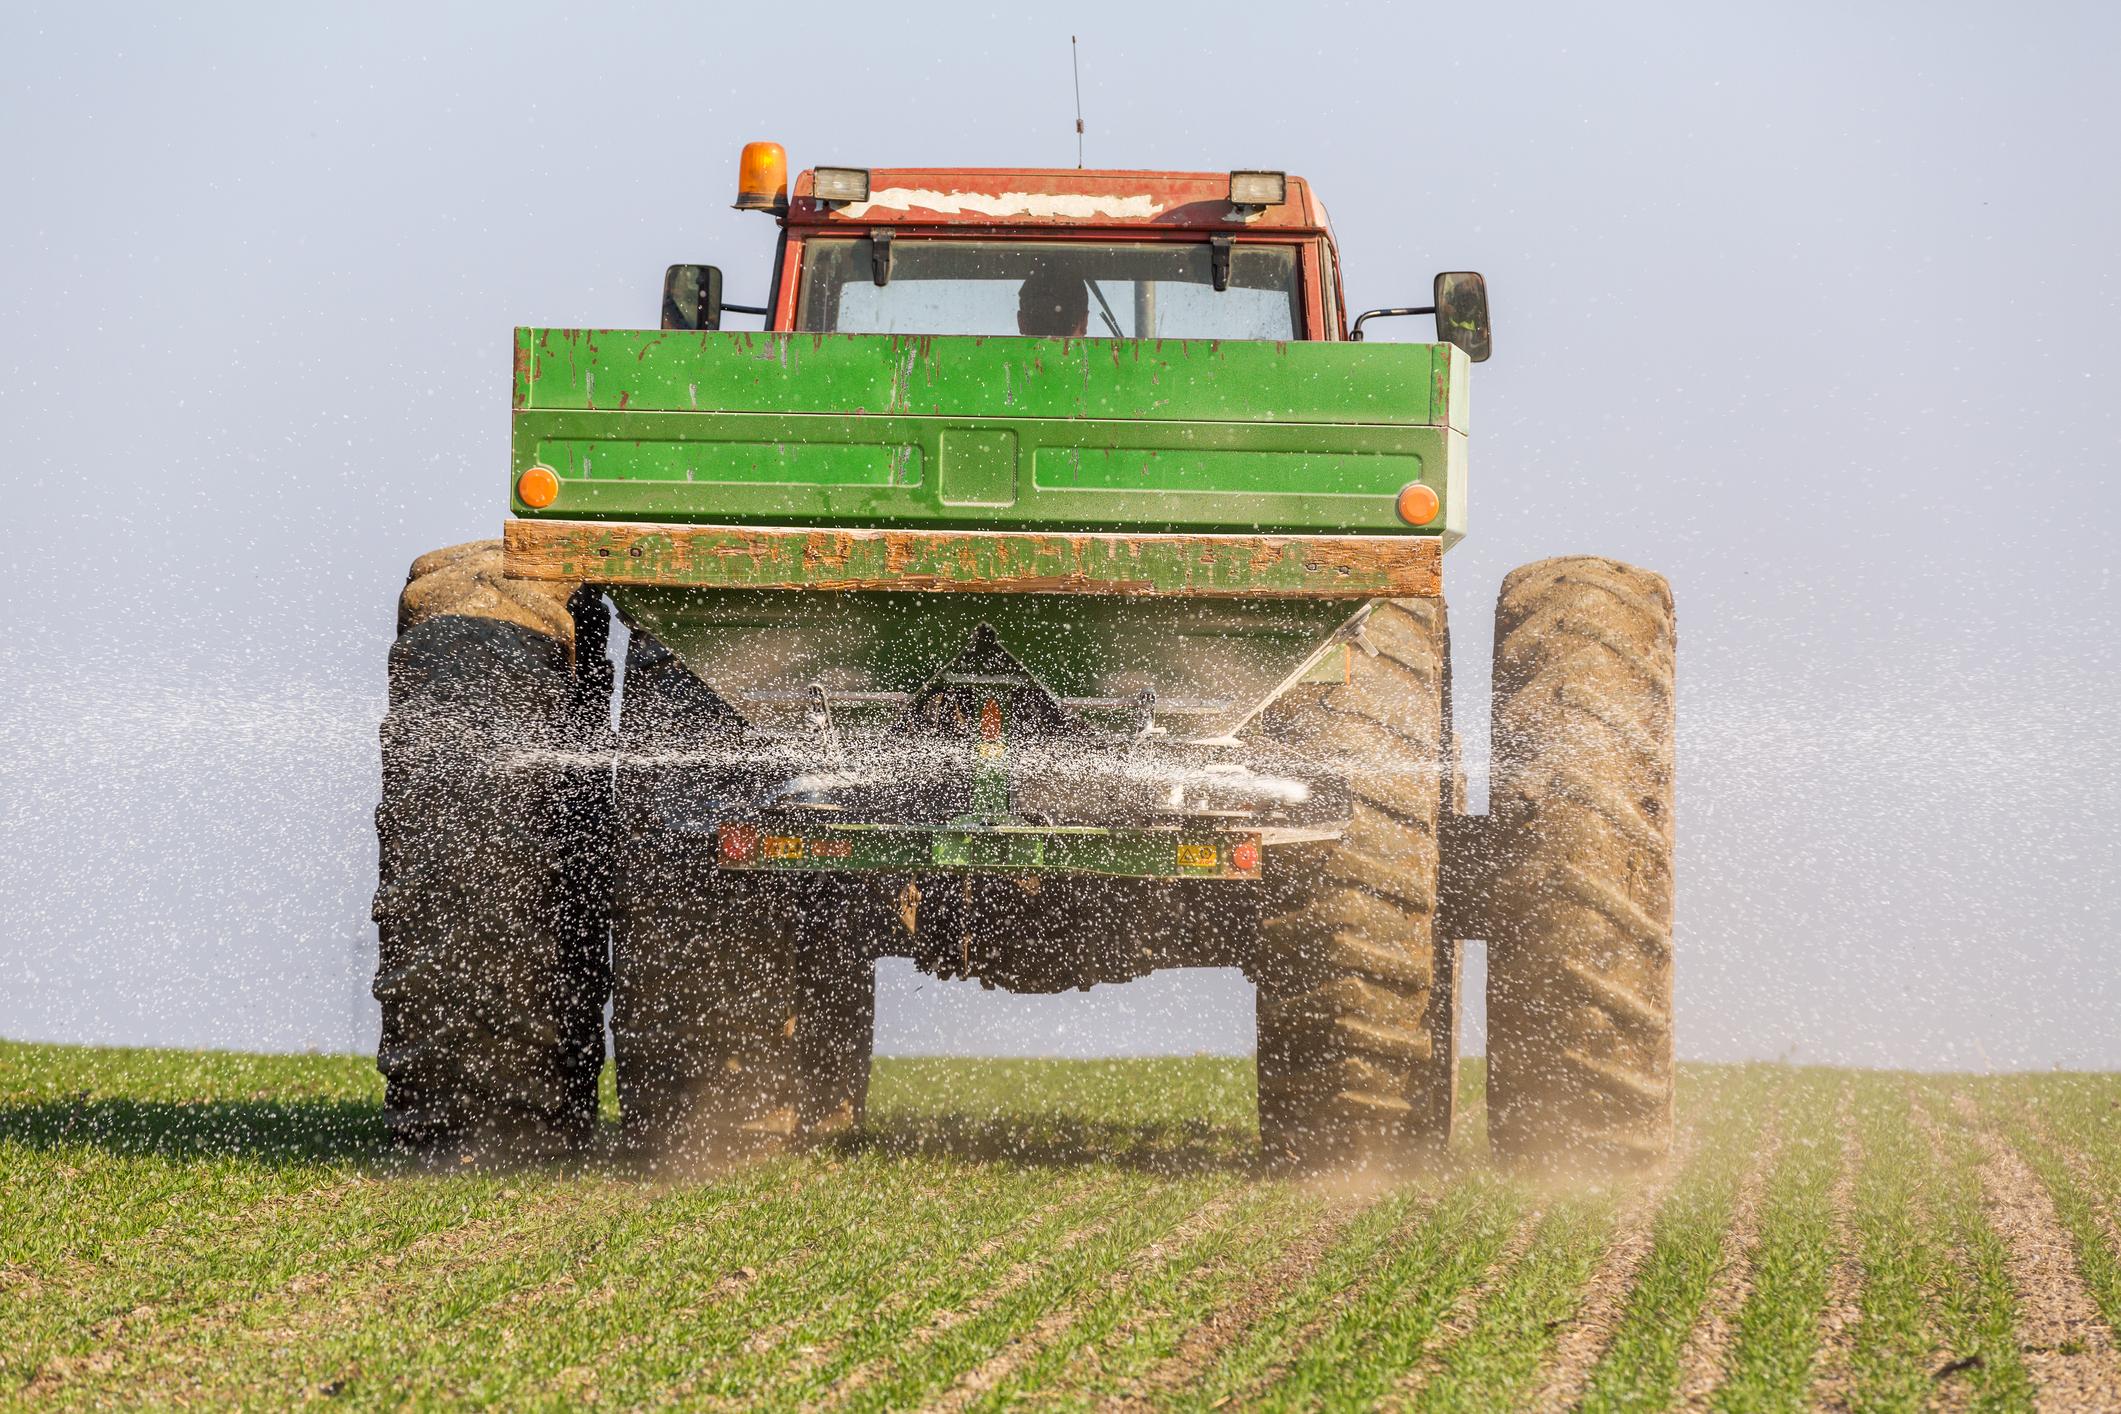 A tractor spreading fertilizer on a field.